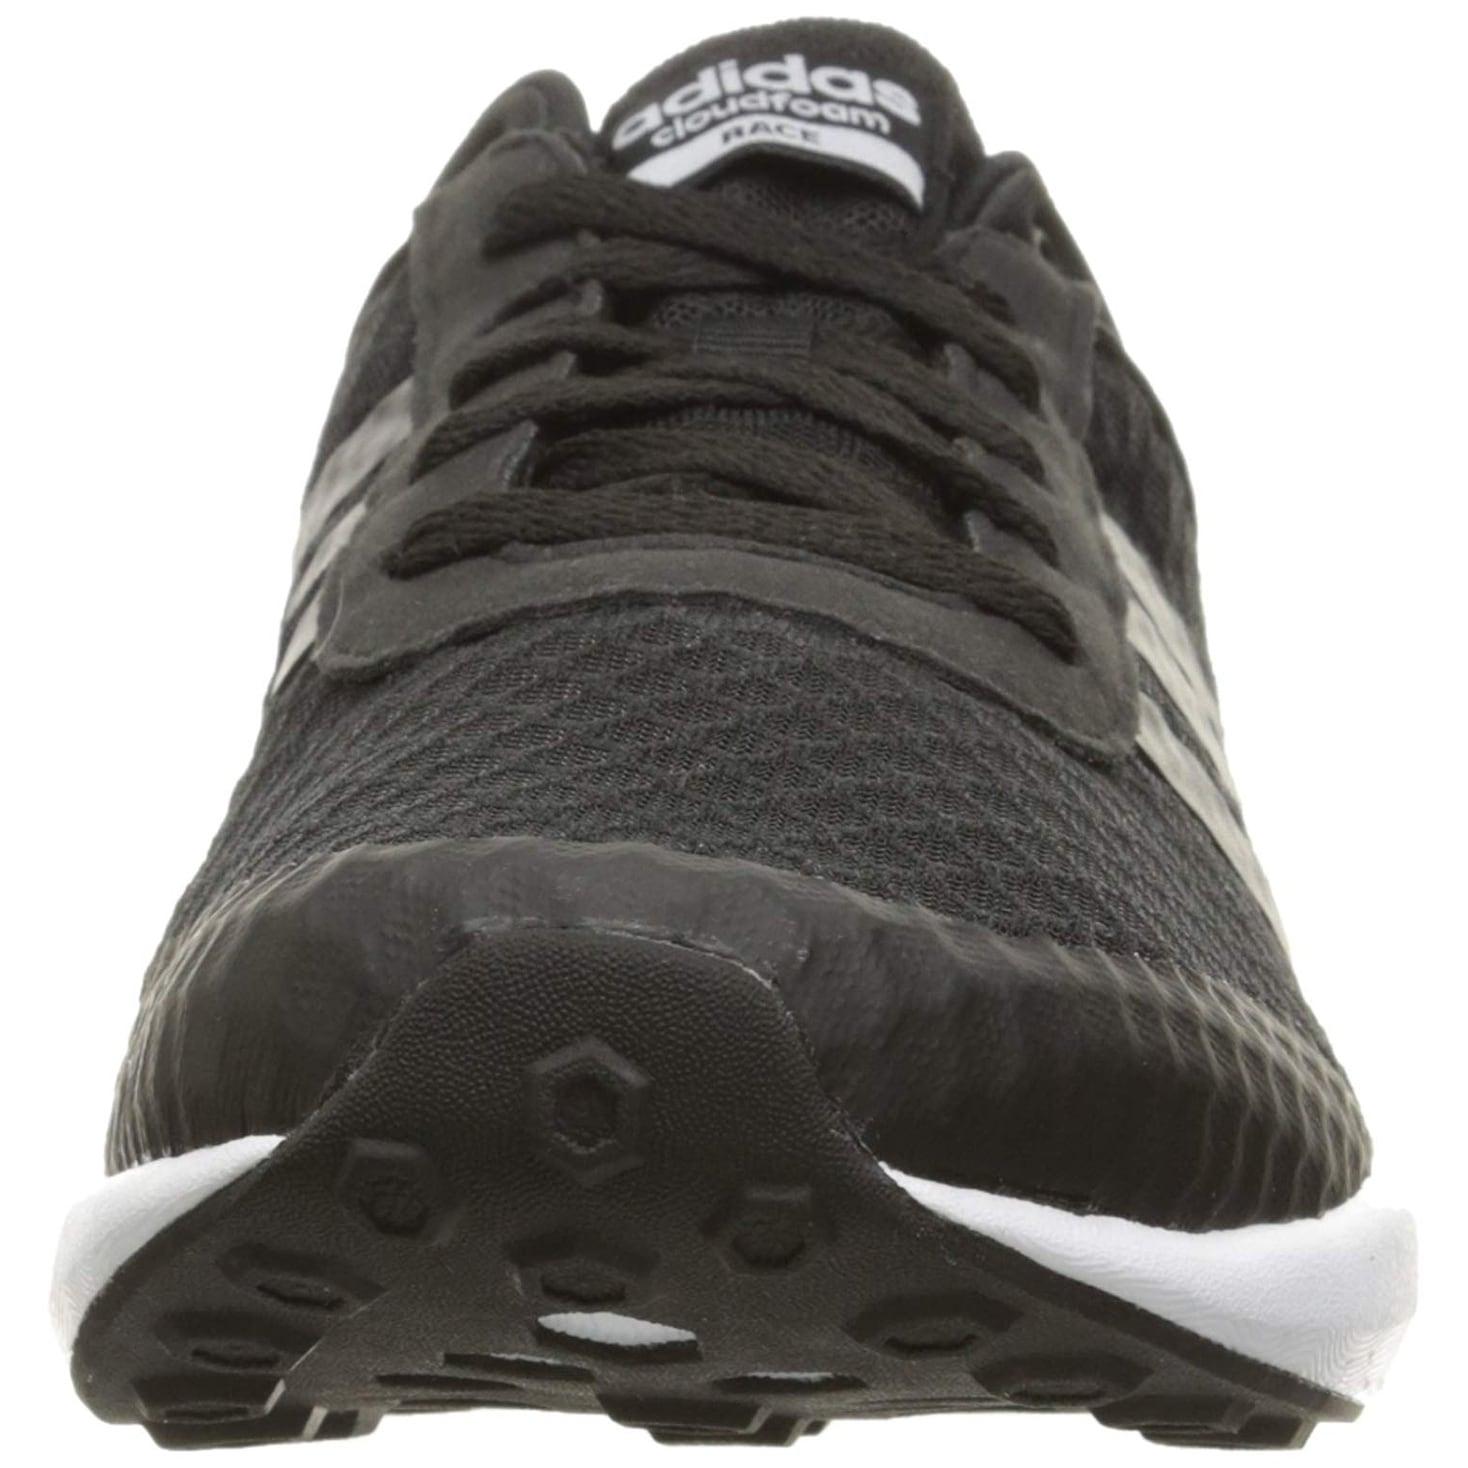 best service 726c9 2528a Shop Adidas Men s Cloudfoam Race Running Shoe, Black White, 8.5 D-Medium -  Free Shipping Today - Overstock - 25660254